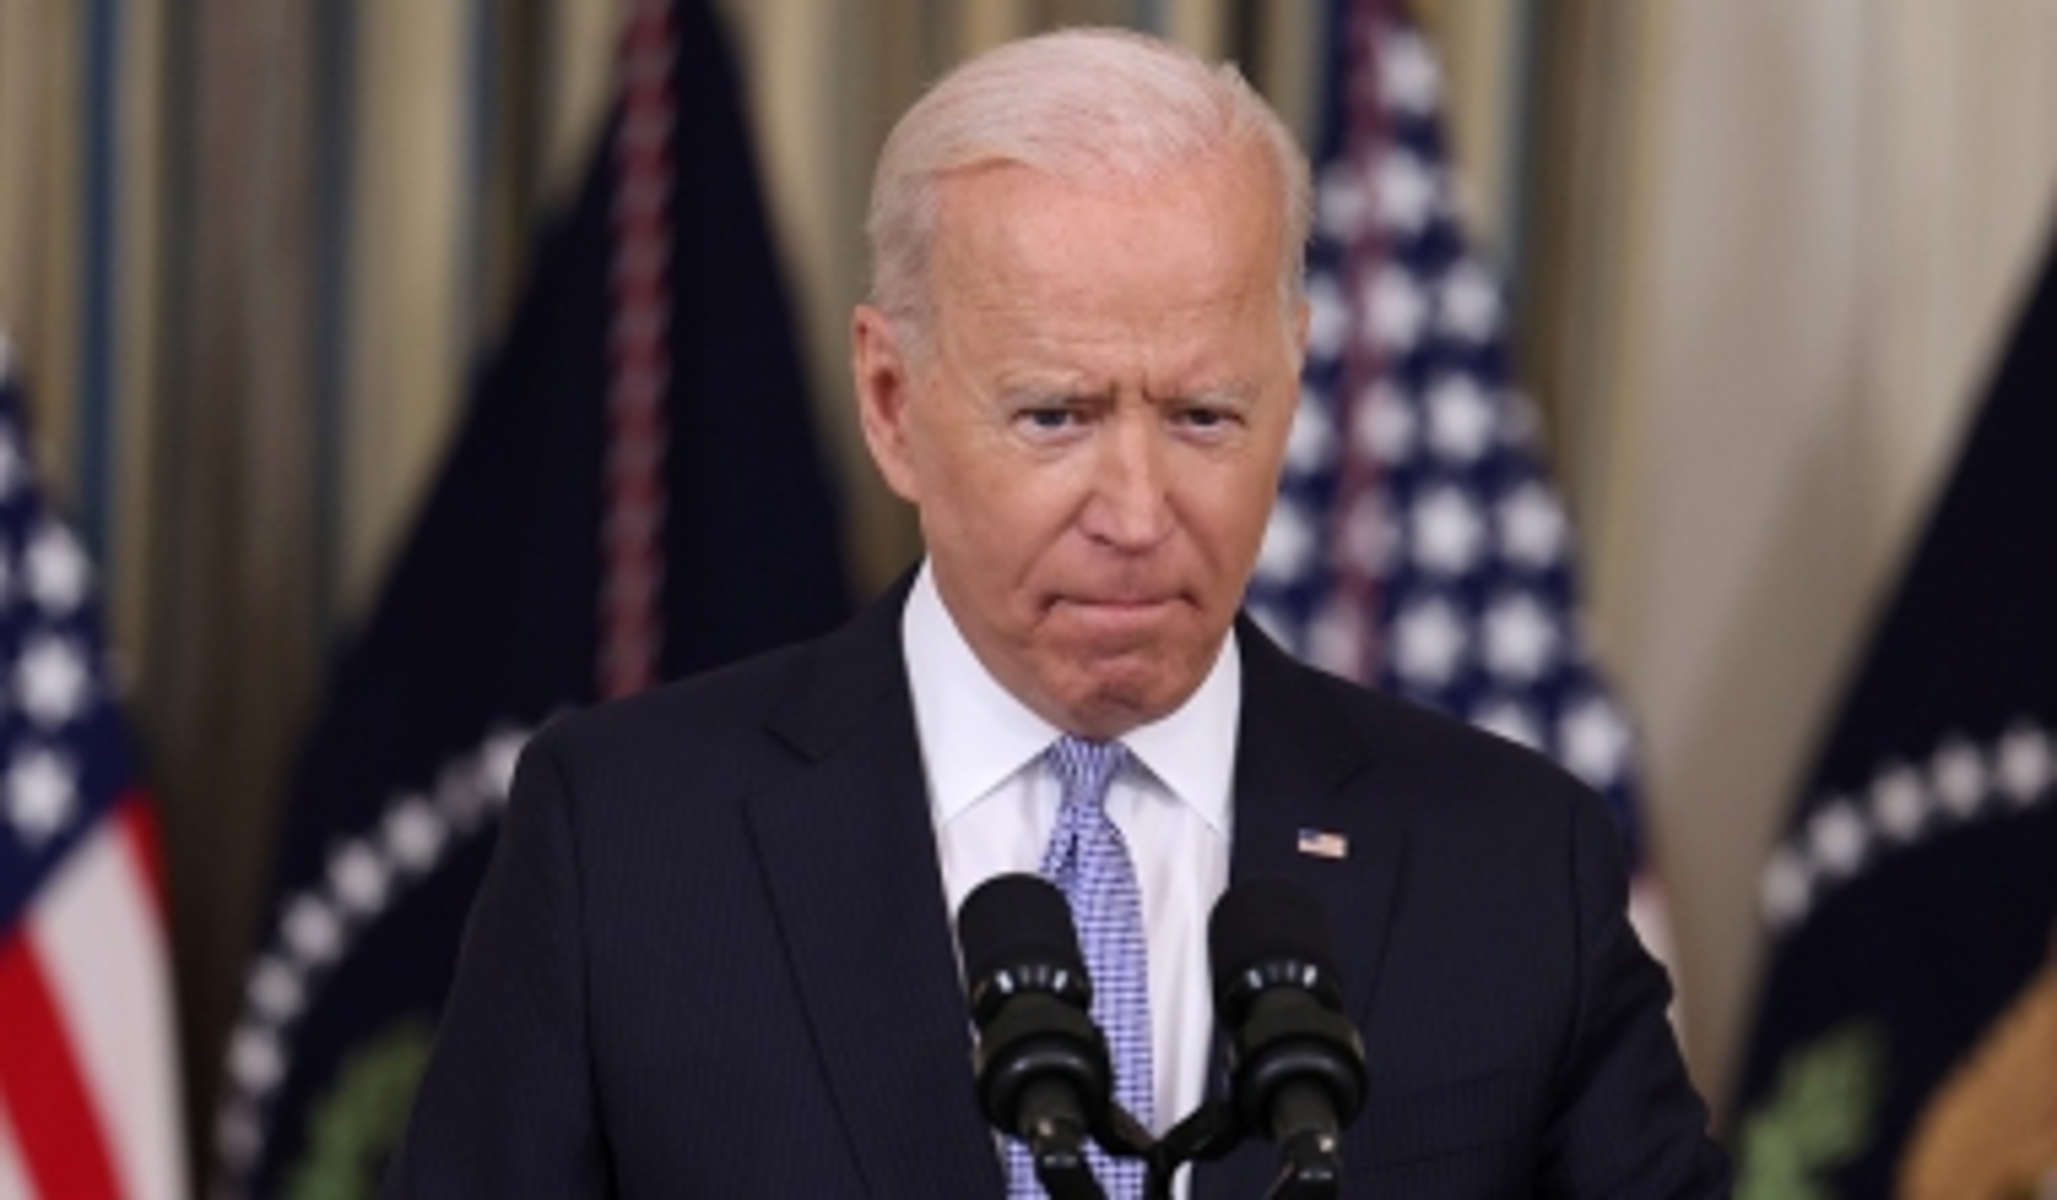 Biden's Tax Plan Calls for Indiscriminate Spying